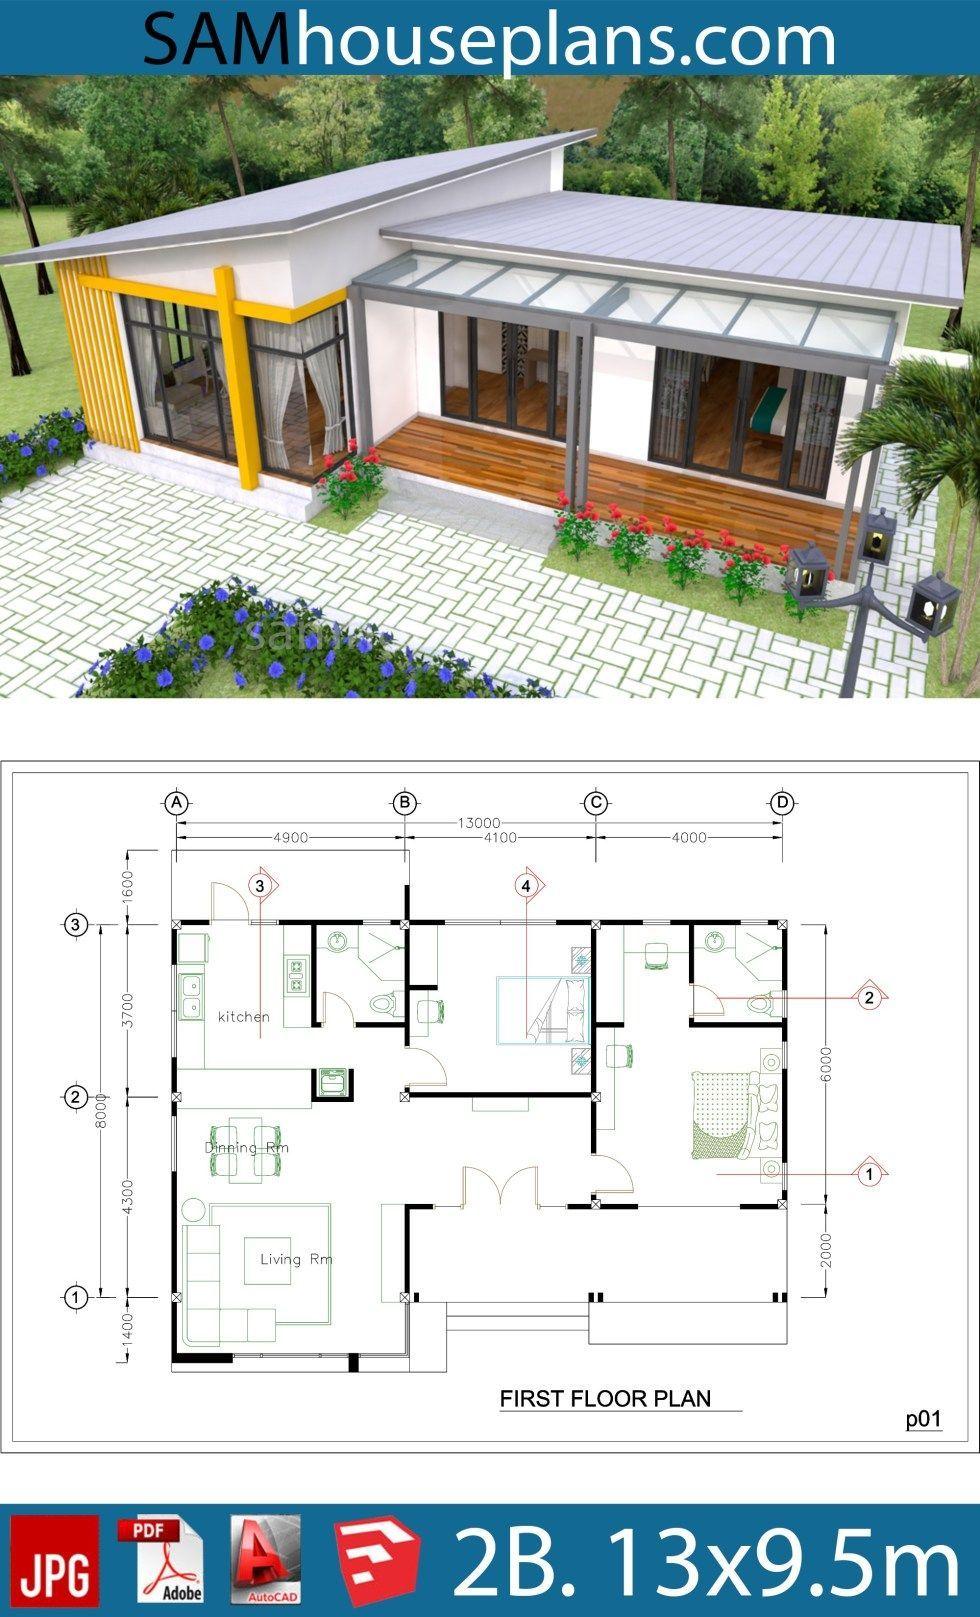 House Plans 13x9 5m Full Plan 2beds Sam House Plans Small House Design Plans Simple House Design Sims House Plans